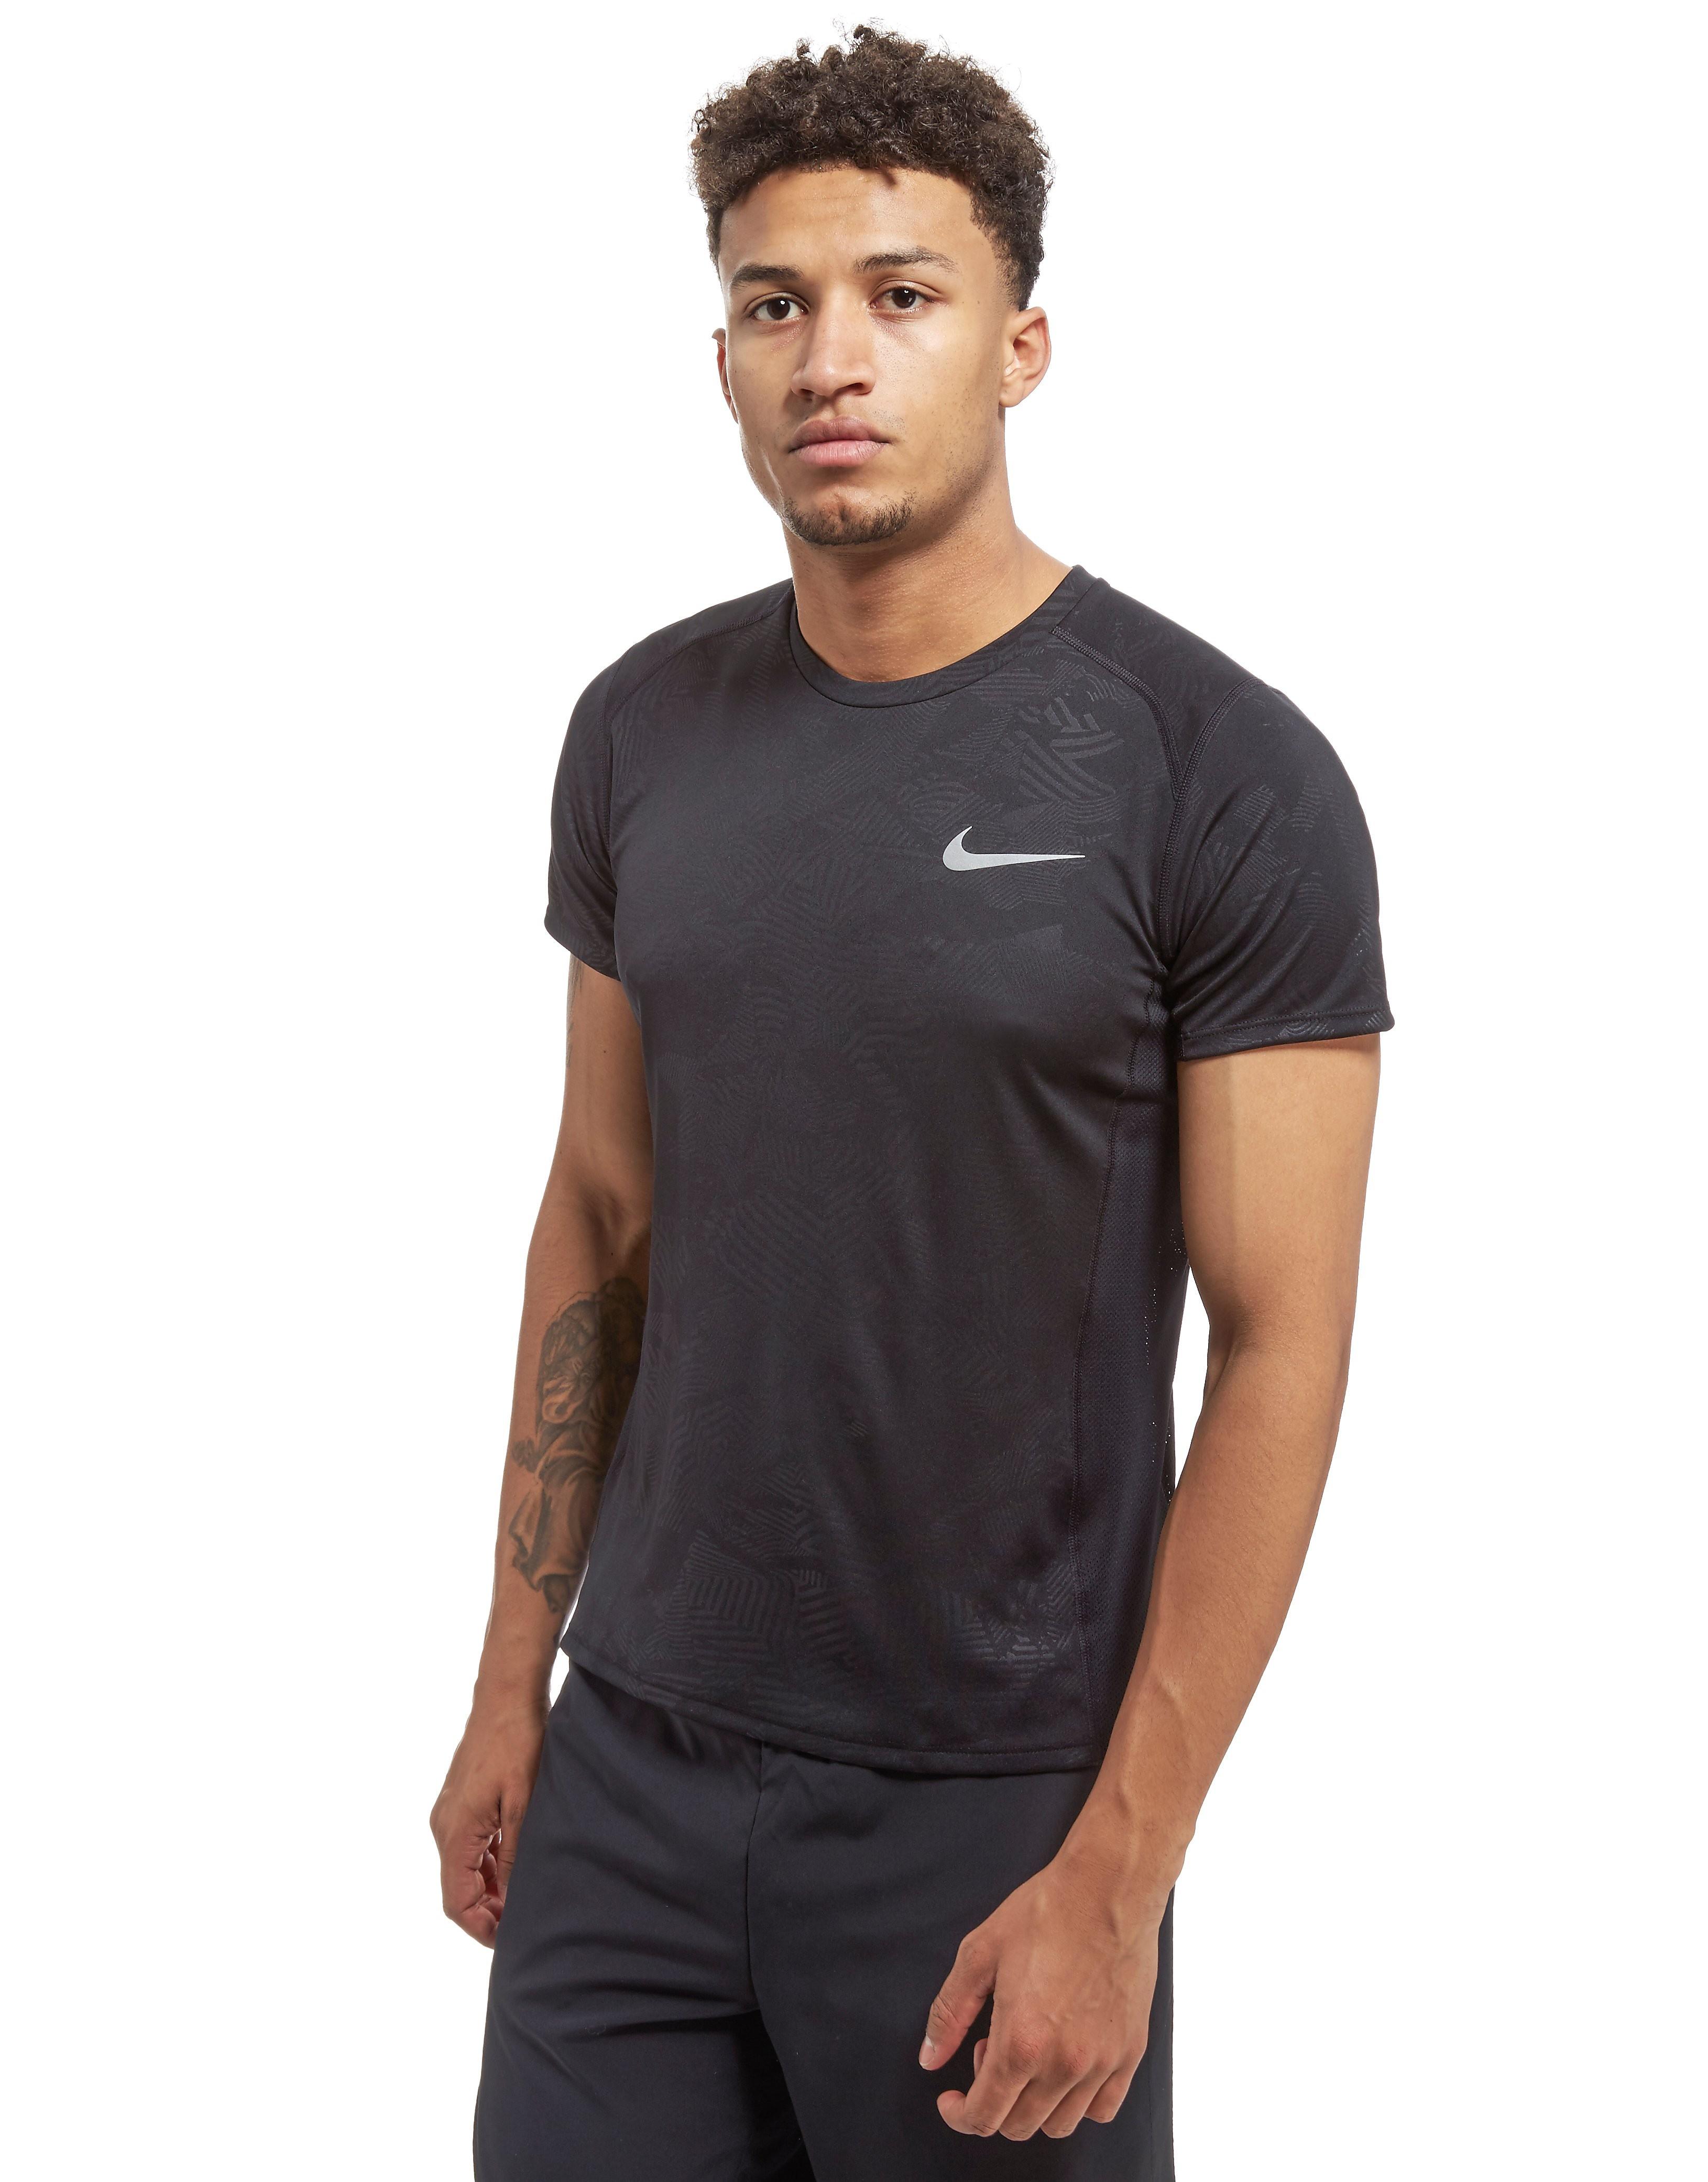 Nike camiseta Printed Miler